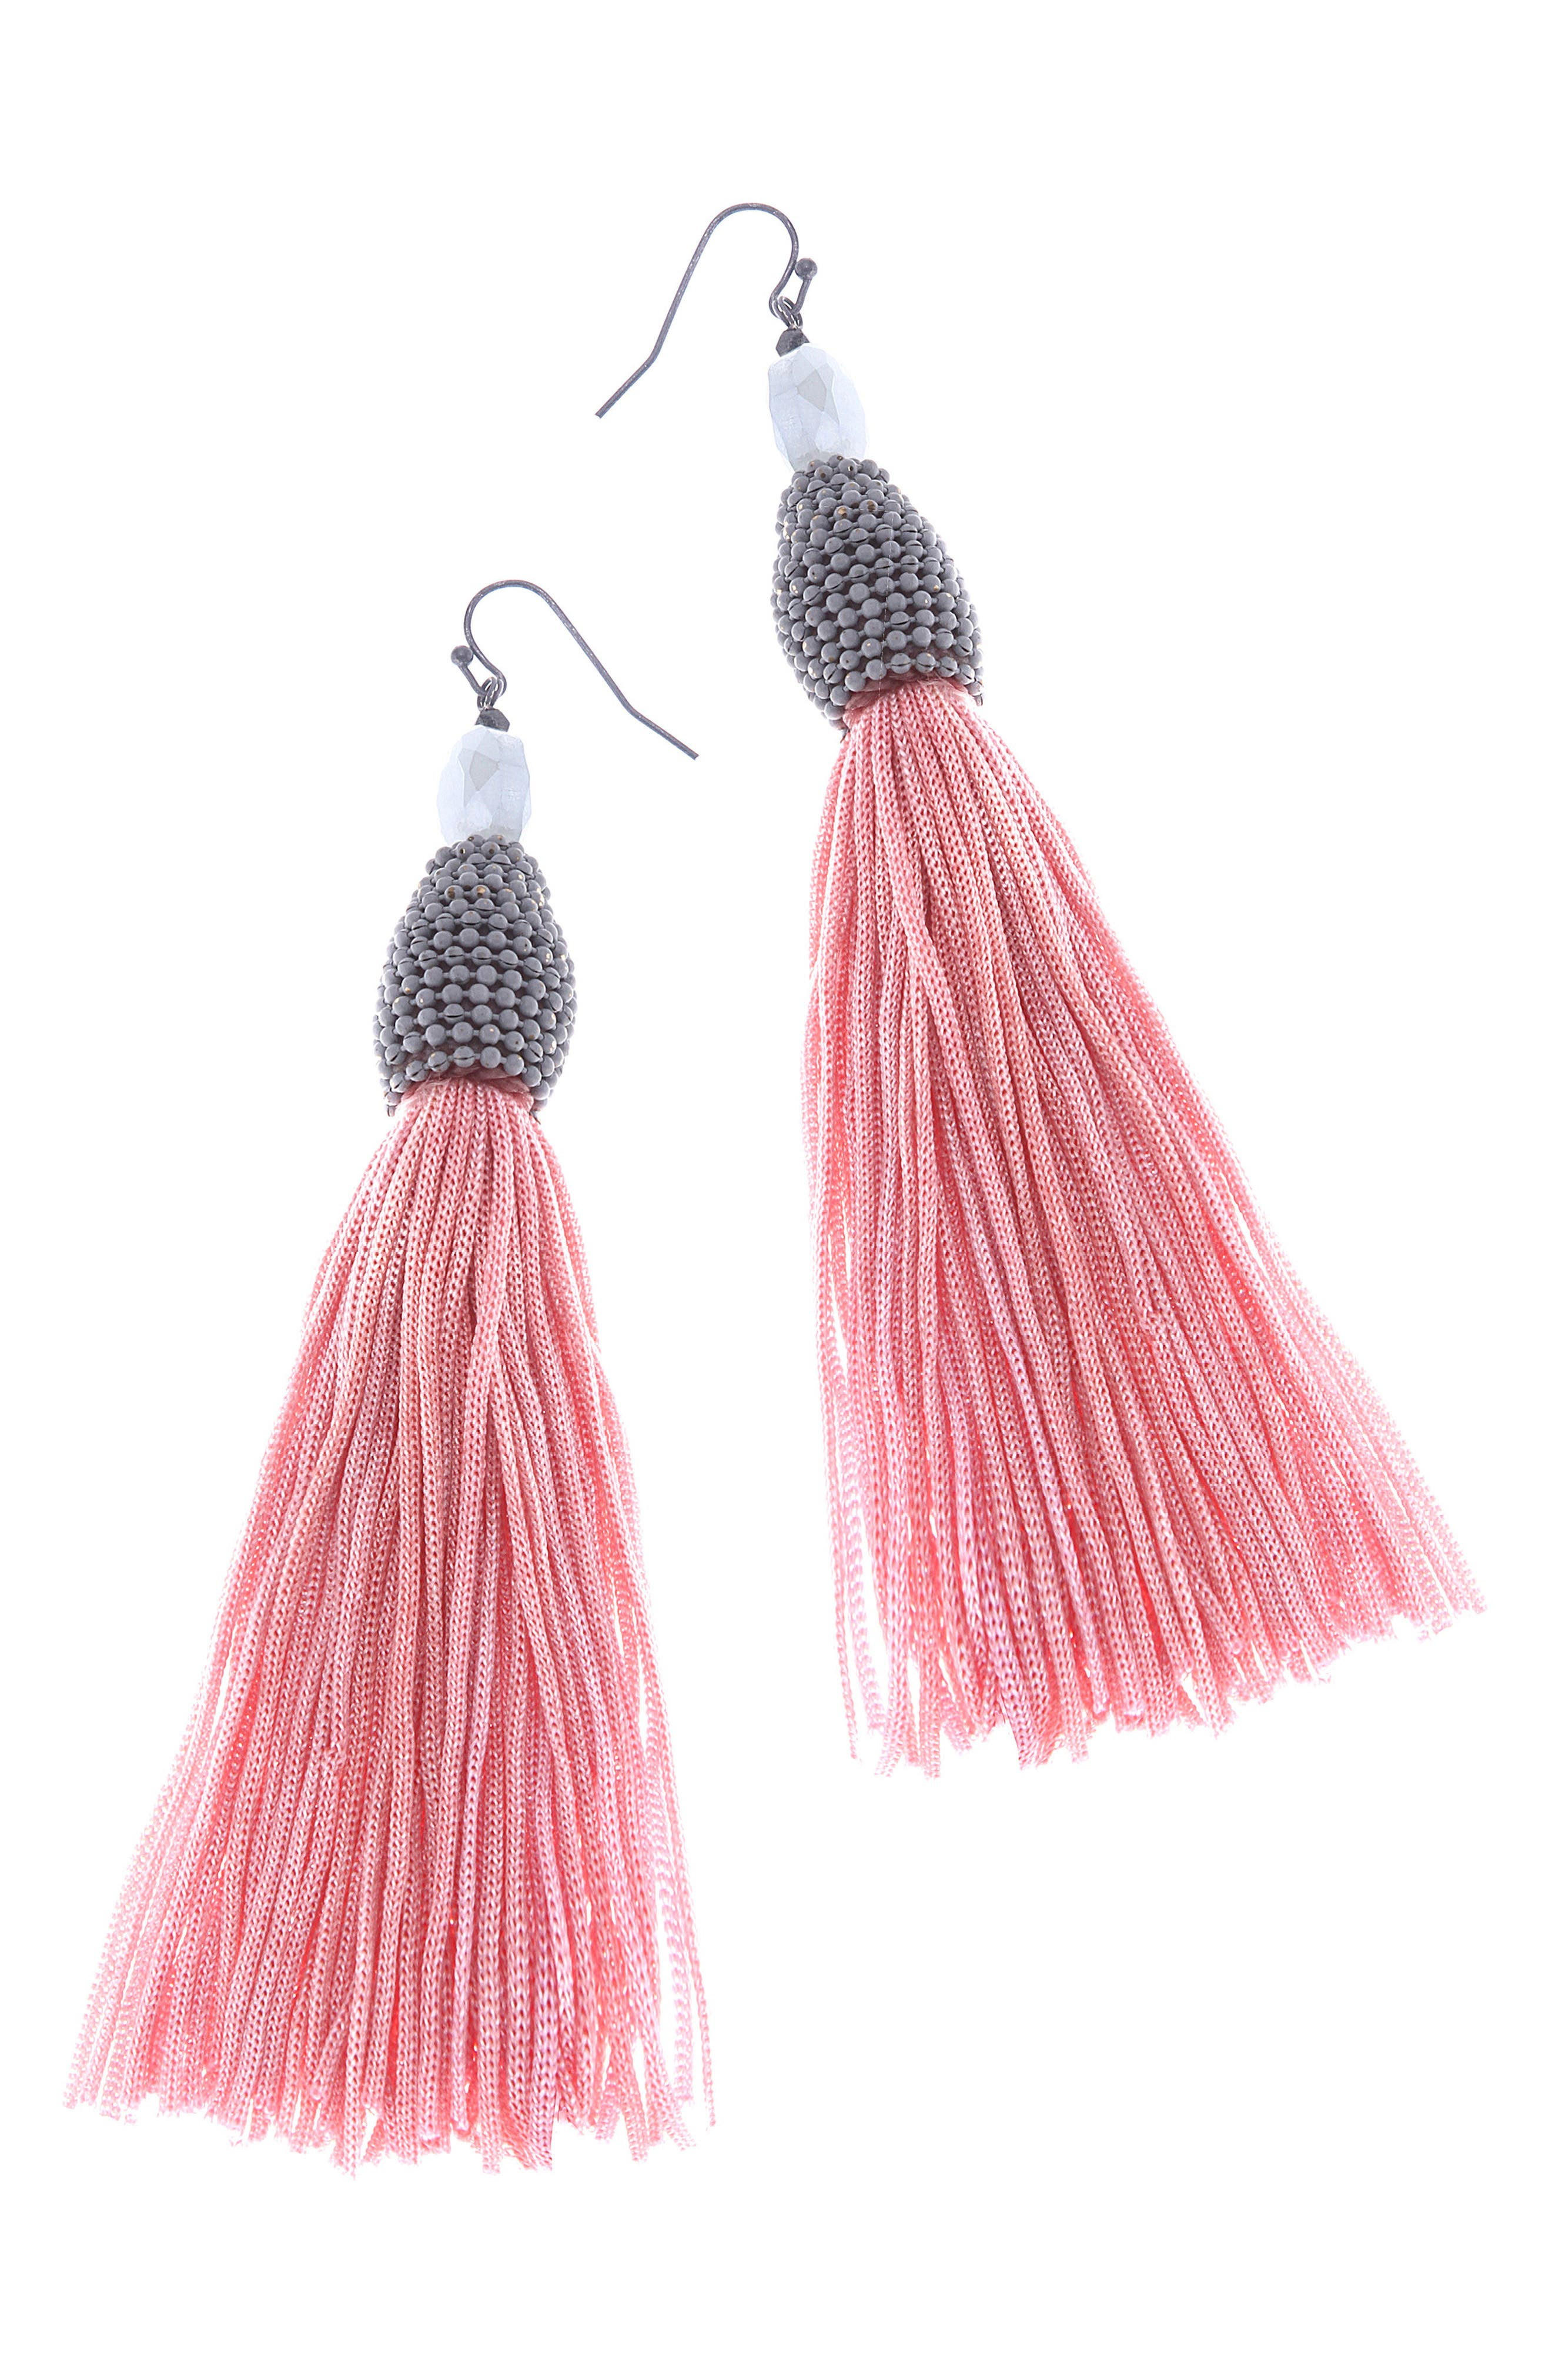 Tassel Earrings,                             Main thumbnail 1, color,                             Pink